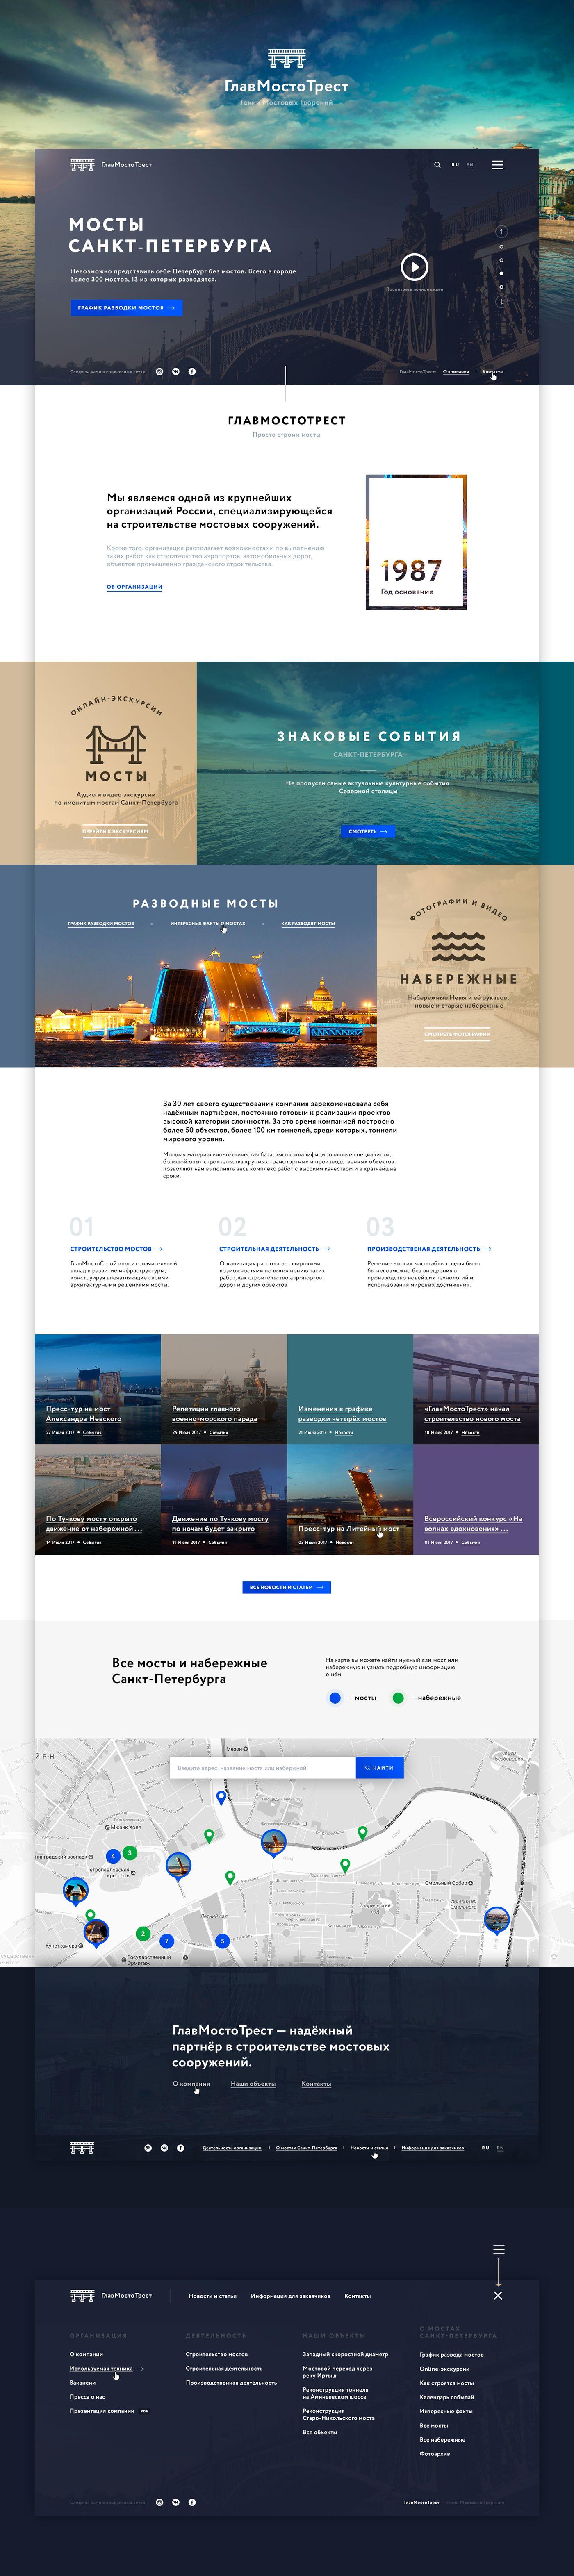 Bridges In Sankt Peterburg Design For Construction Company Corporate Website Design Web Layout Design Webpage Design